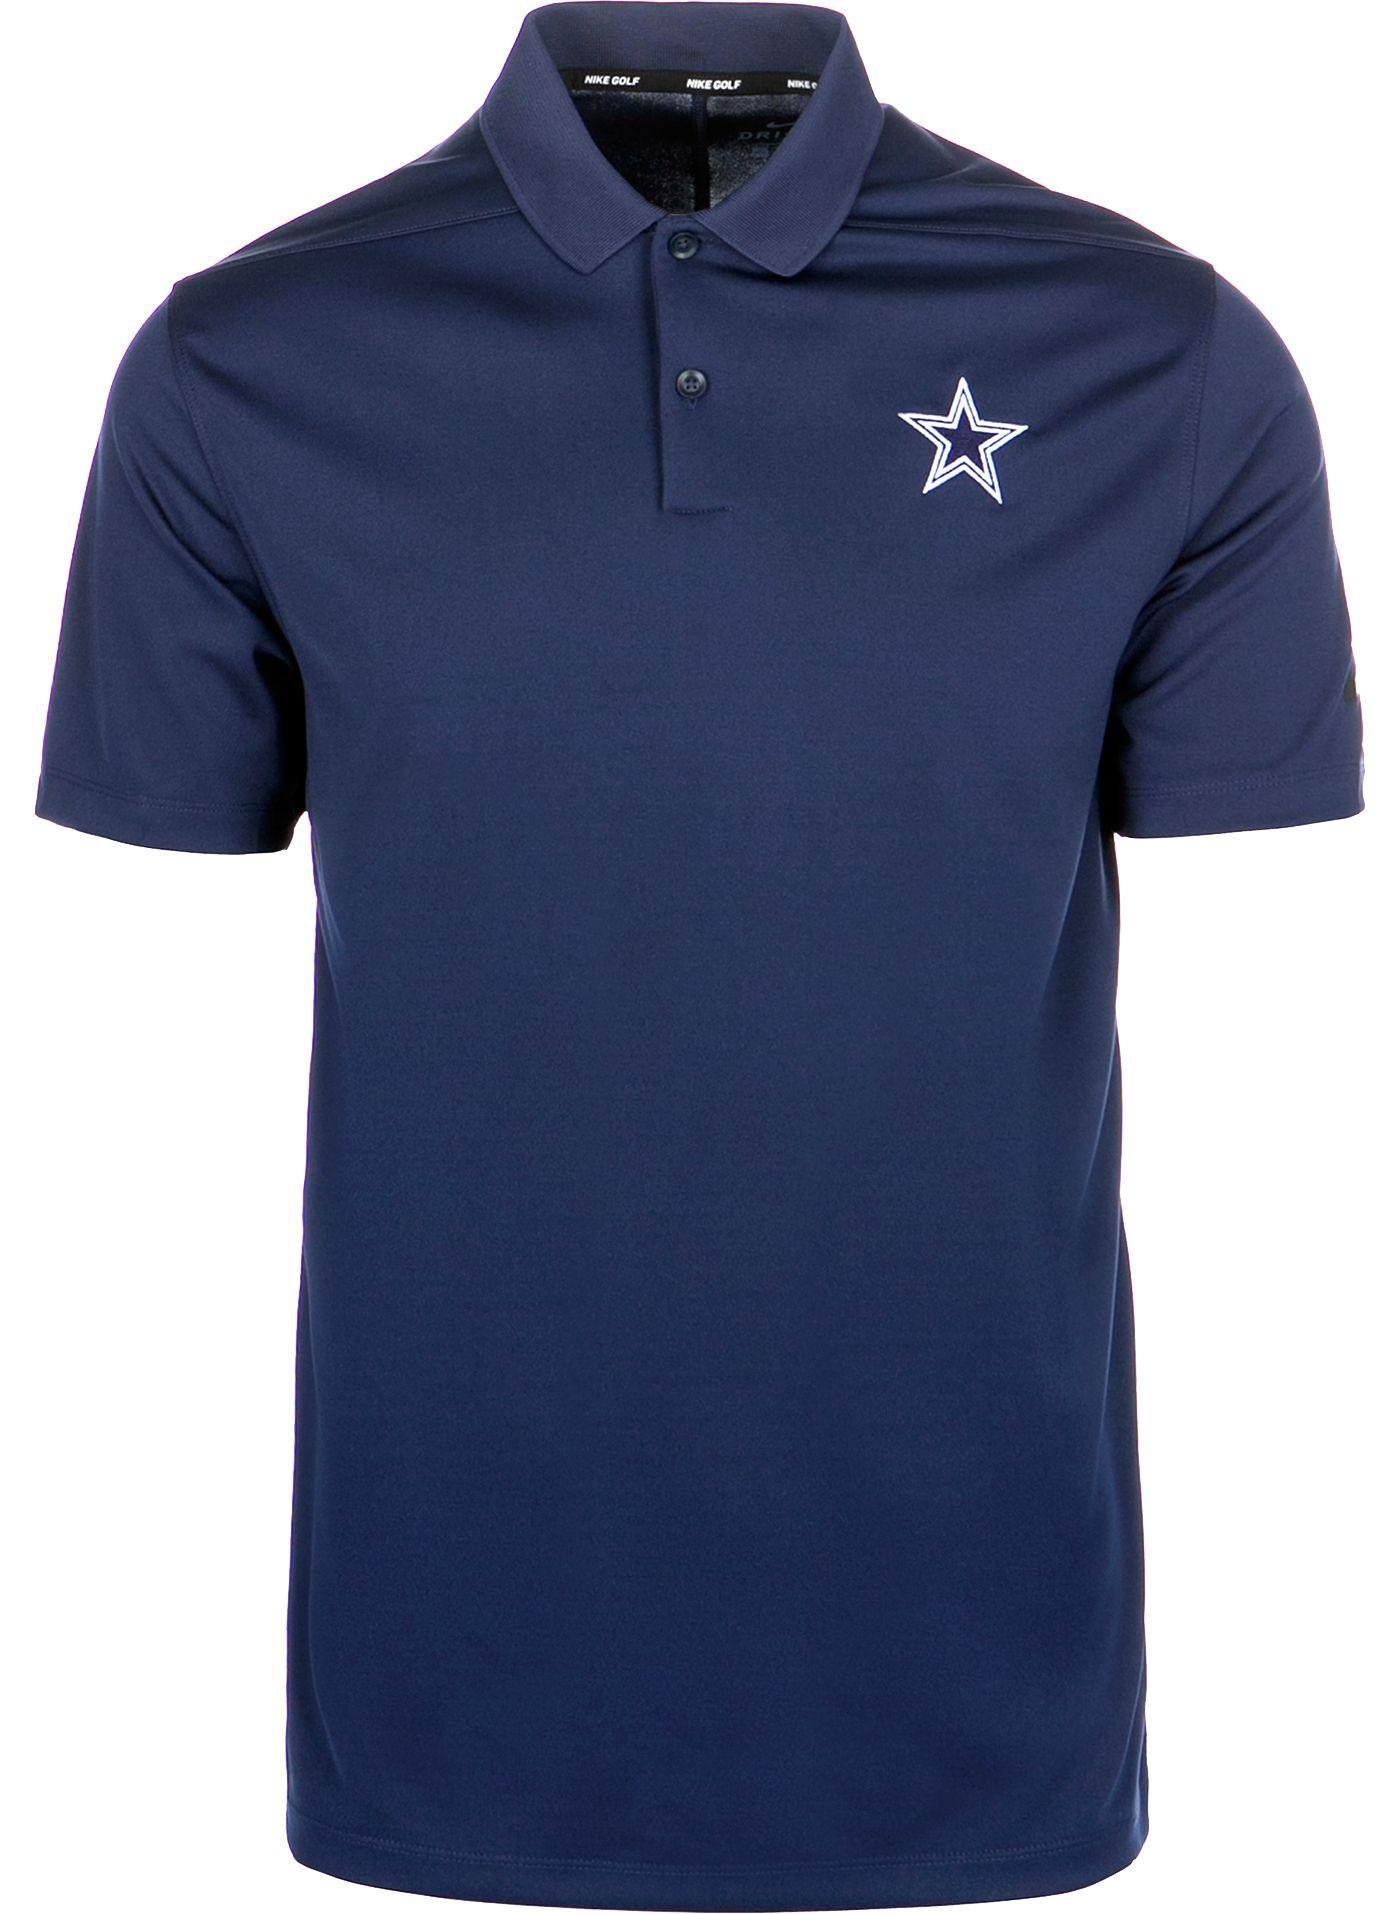 Nike Men's Dallas Cowboys Victory Golf Navy Polo